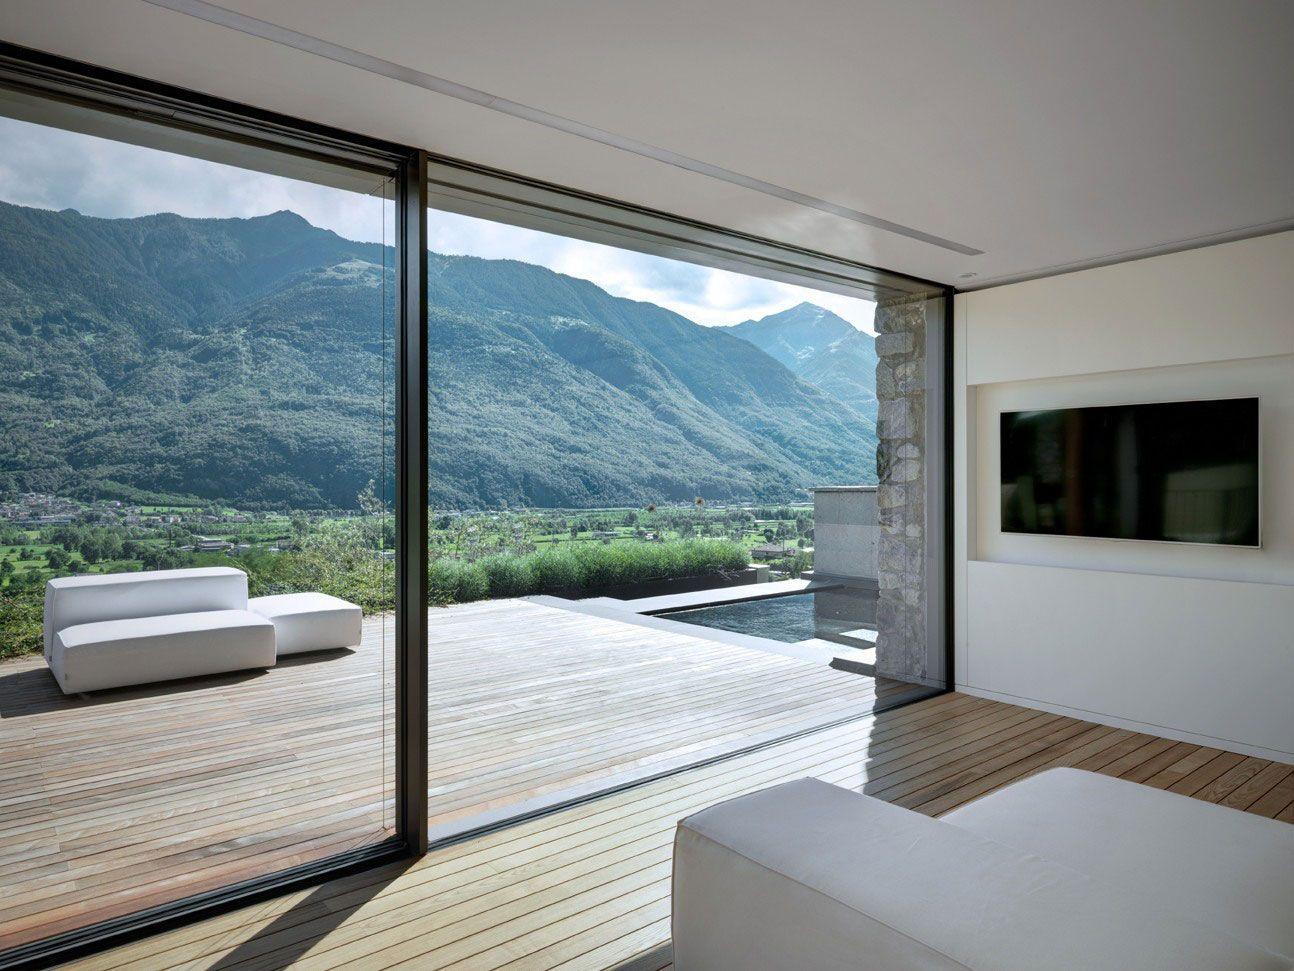 D life home interiors casa mt by rocco borromini   architectureresidential